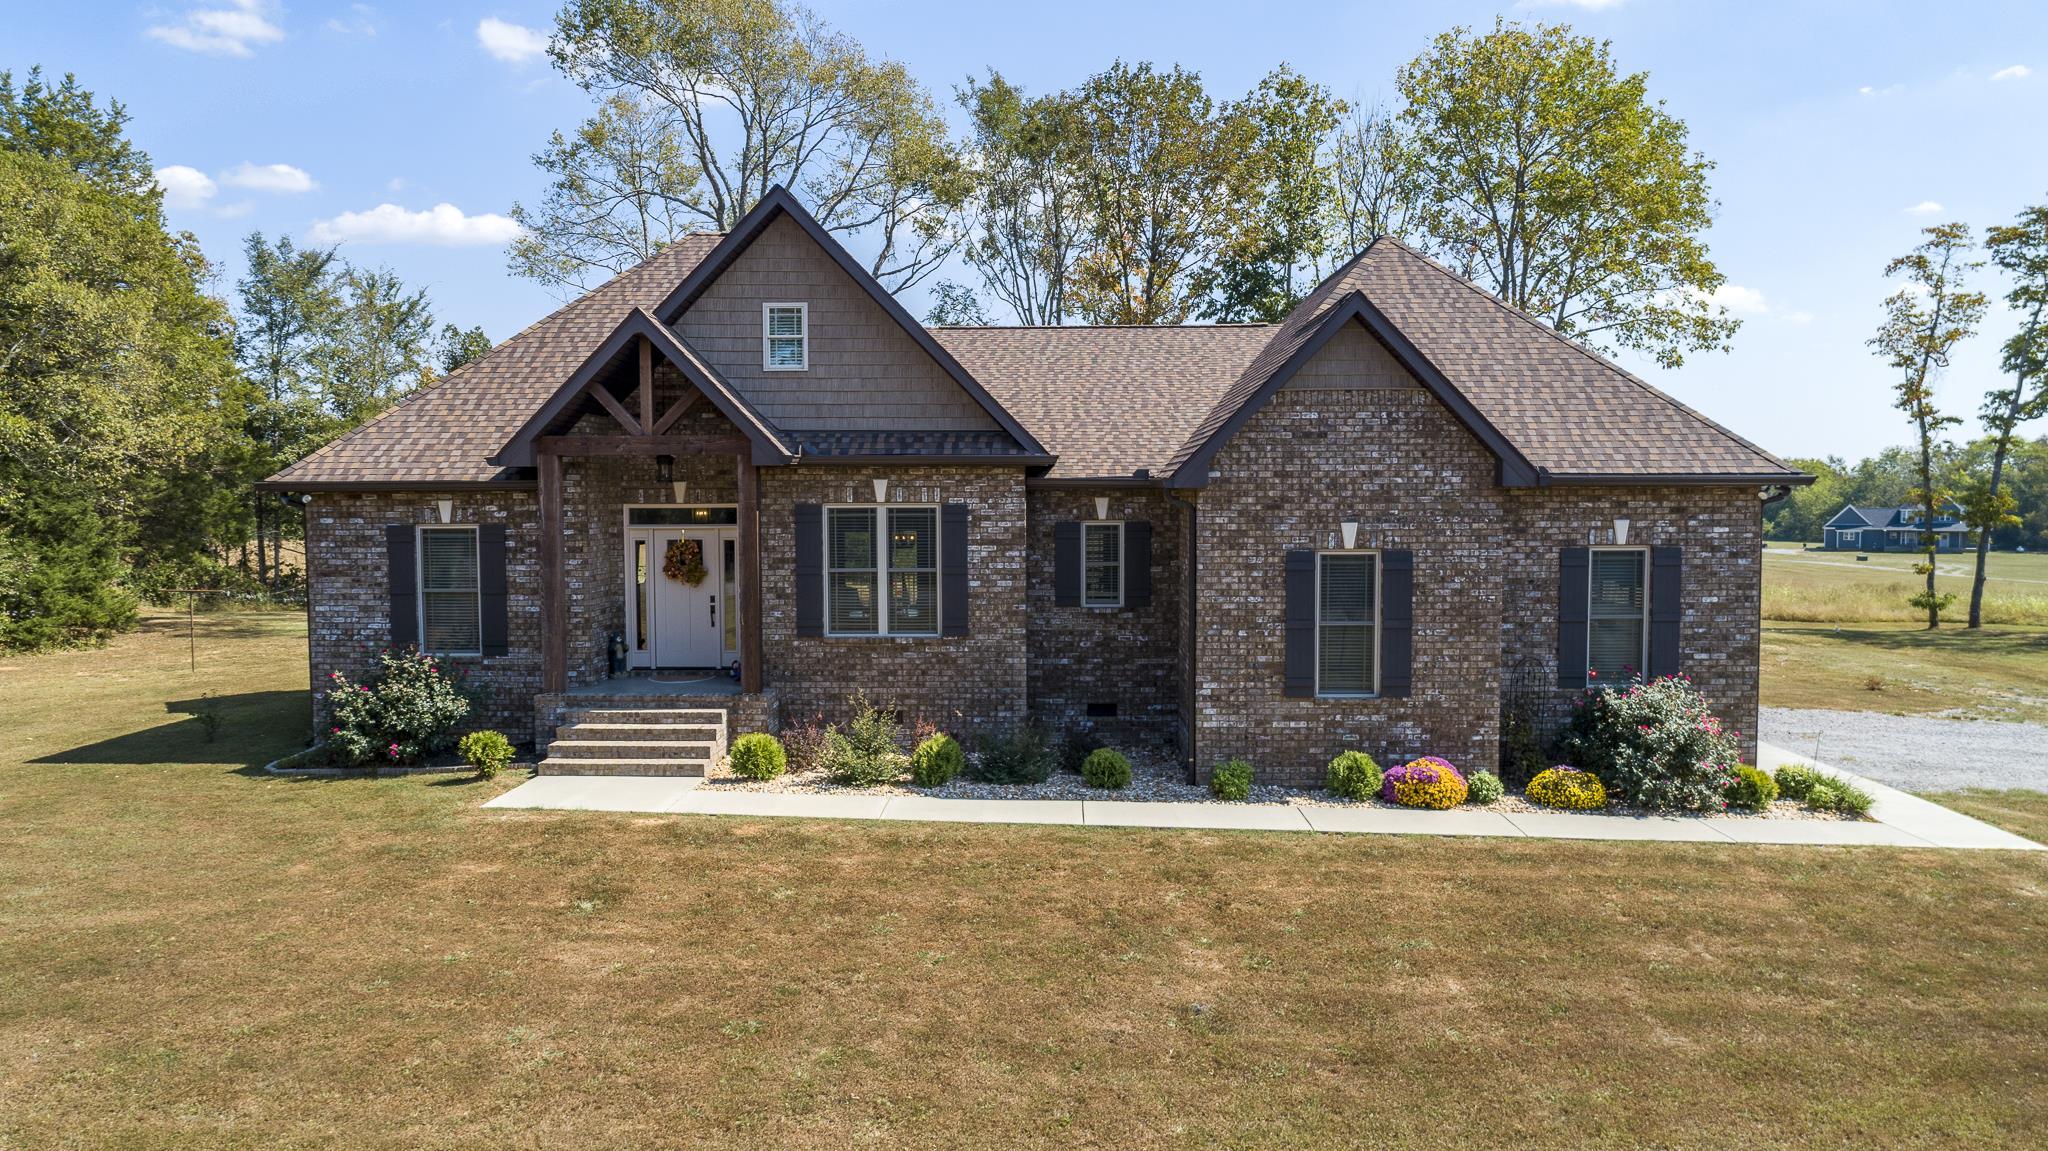 10938 Newtown Rd, Unionville, TN 37180 - Unionville, TN real estate listing